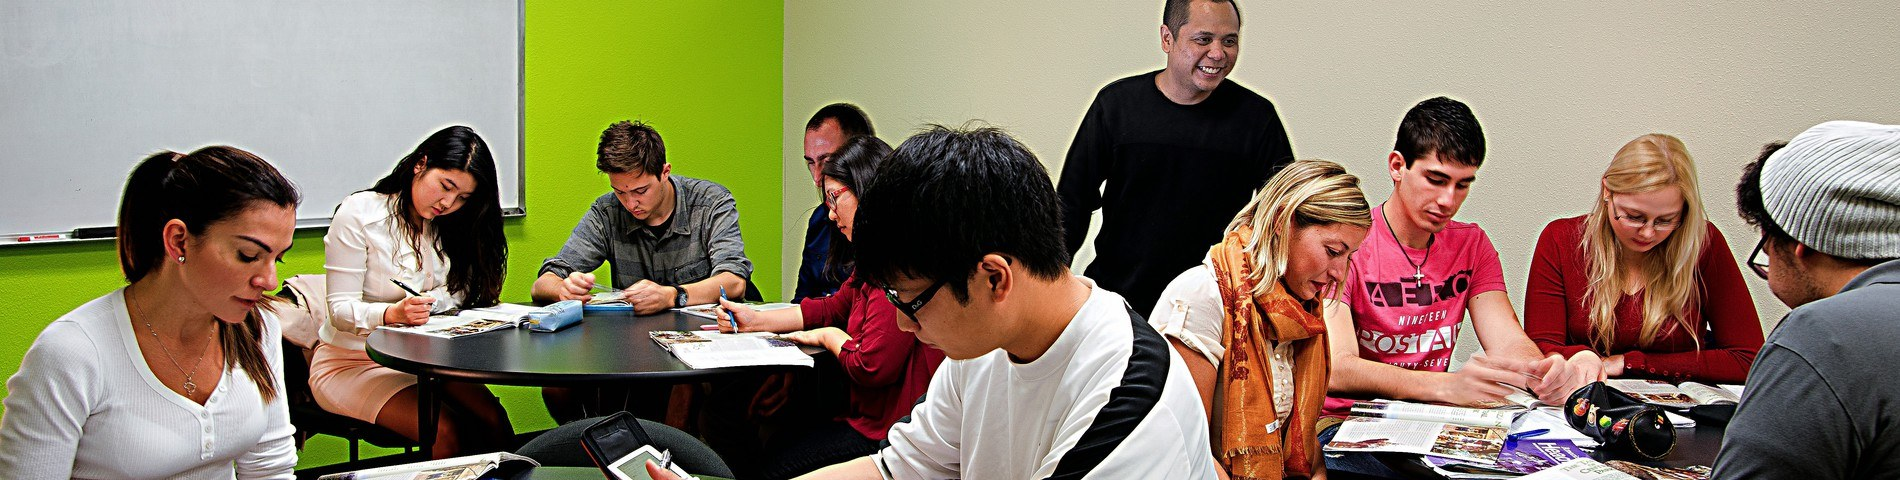 Imagen 1 de la escuela LSI - Language Studies International